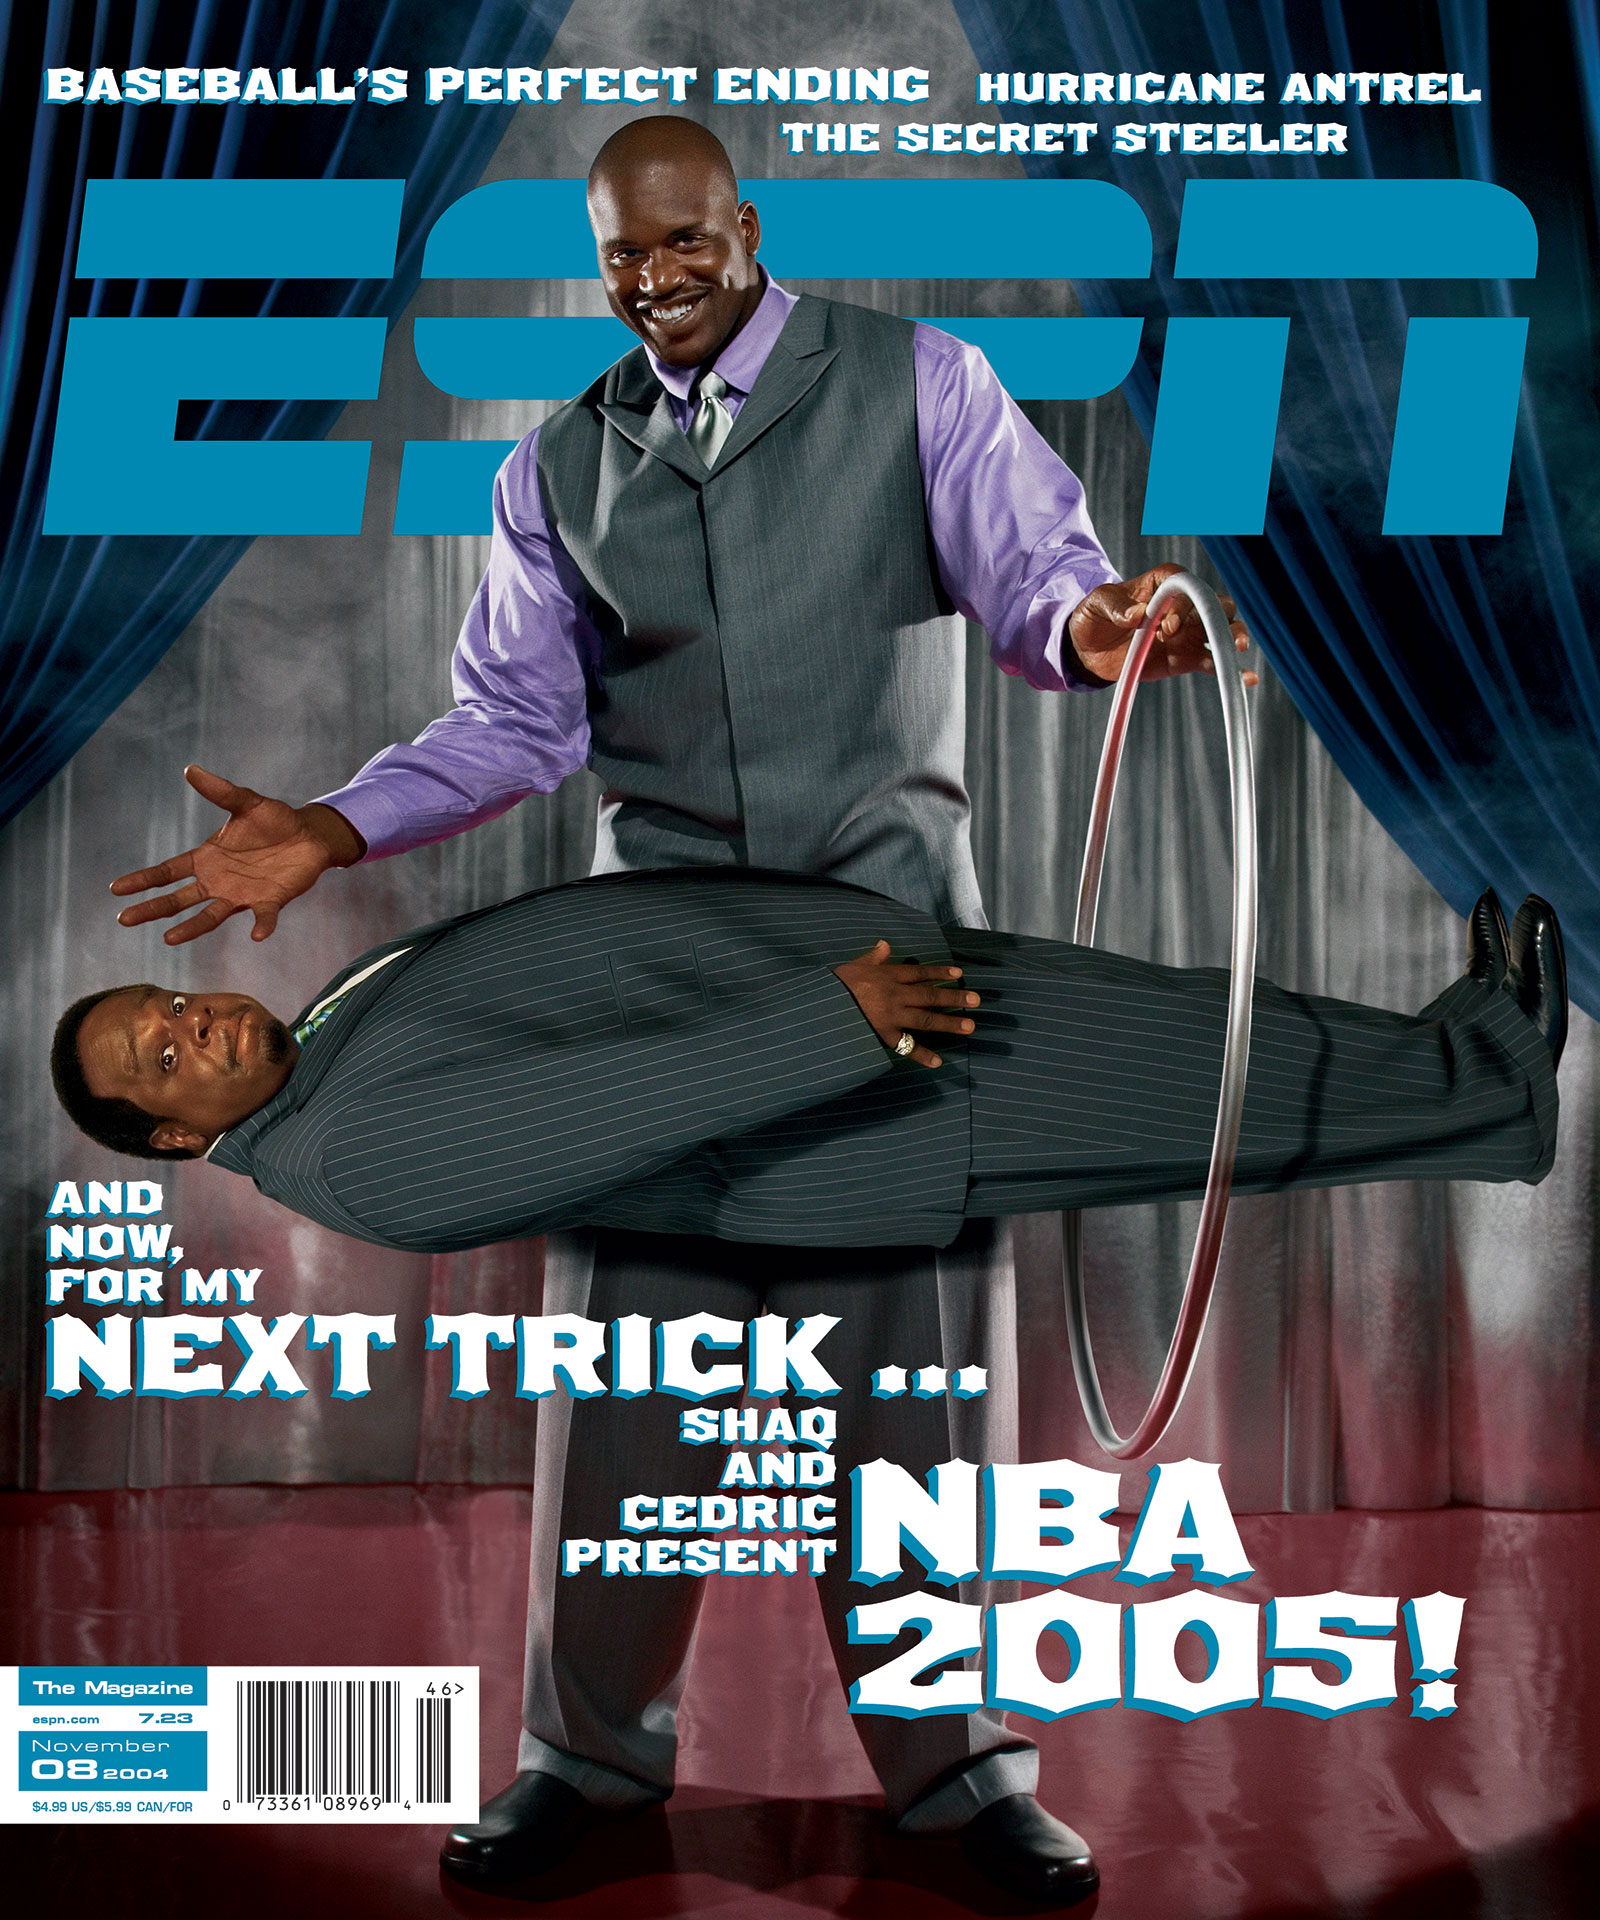 ESPN The Magazine 2004 Covers